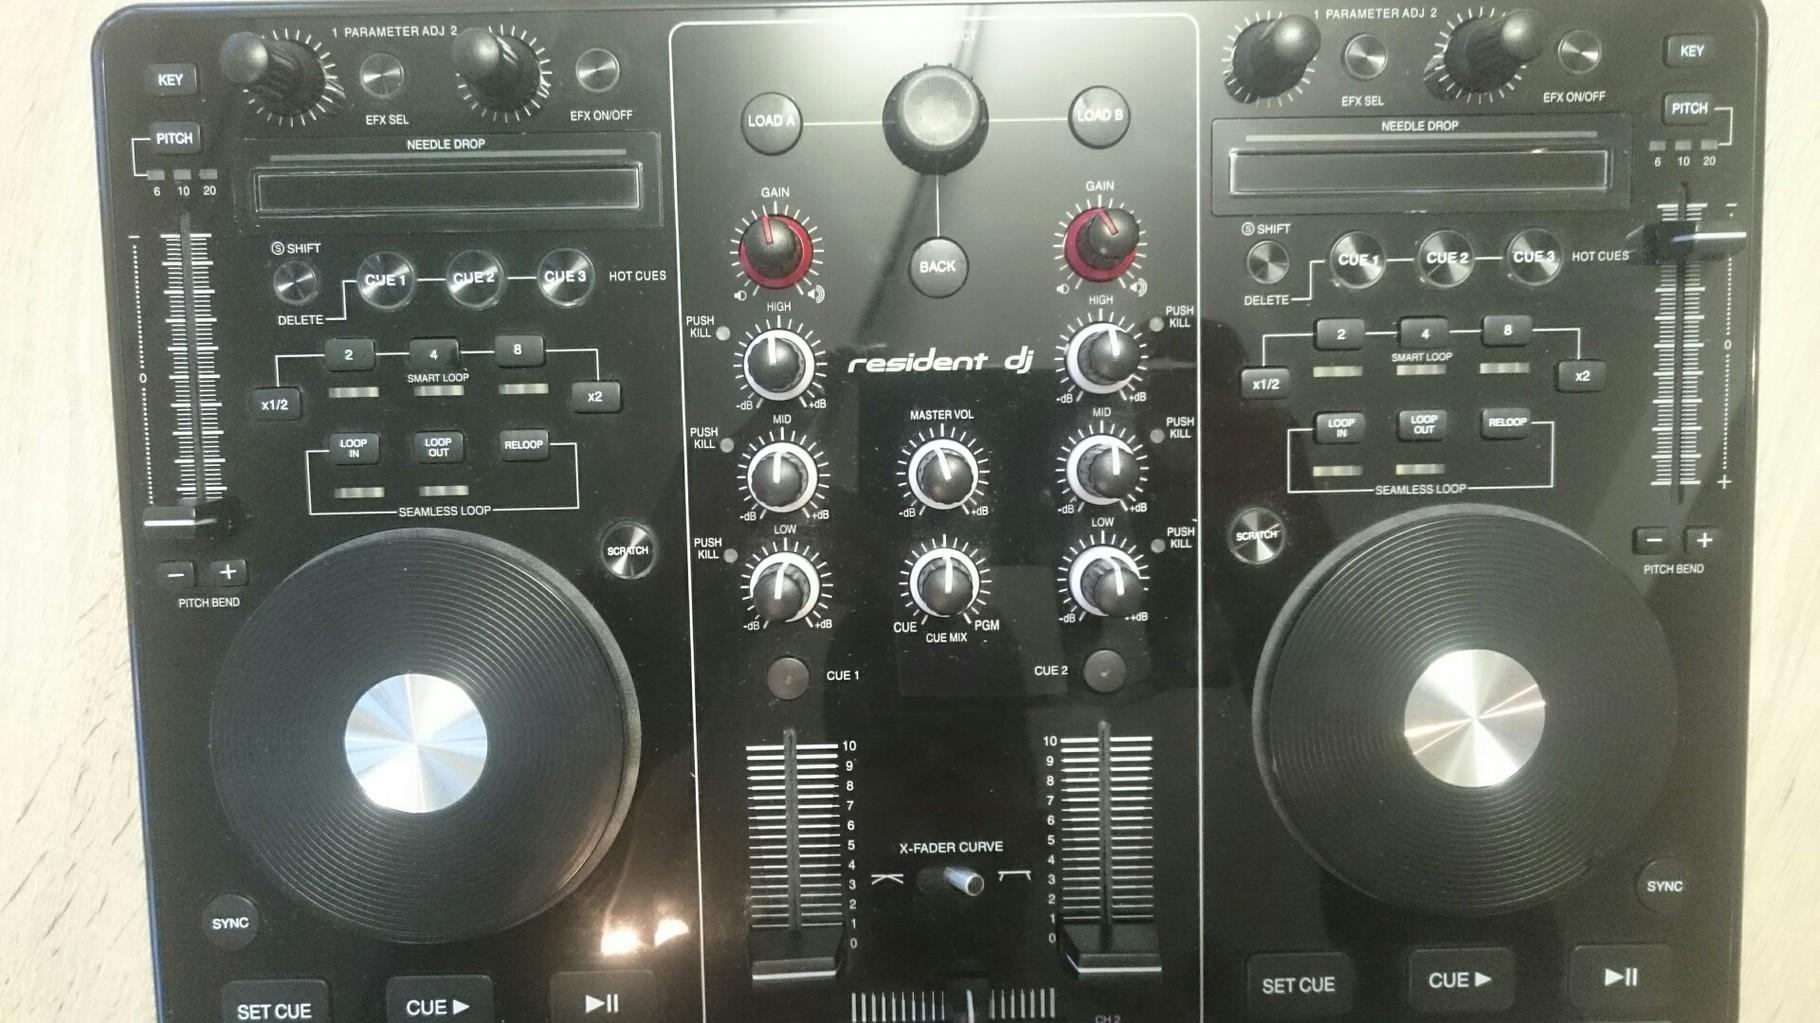 DJ Grevenbroich